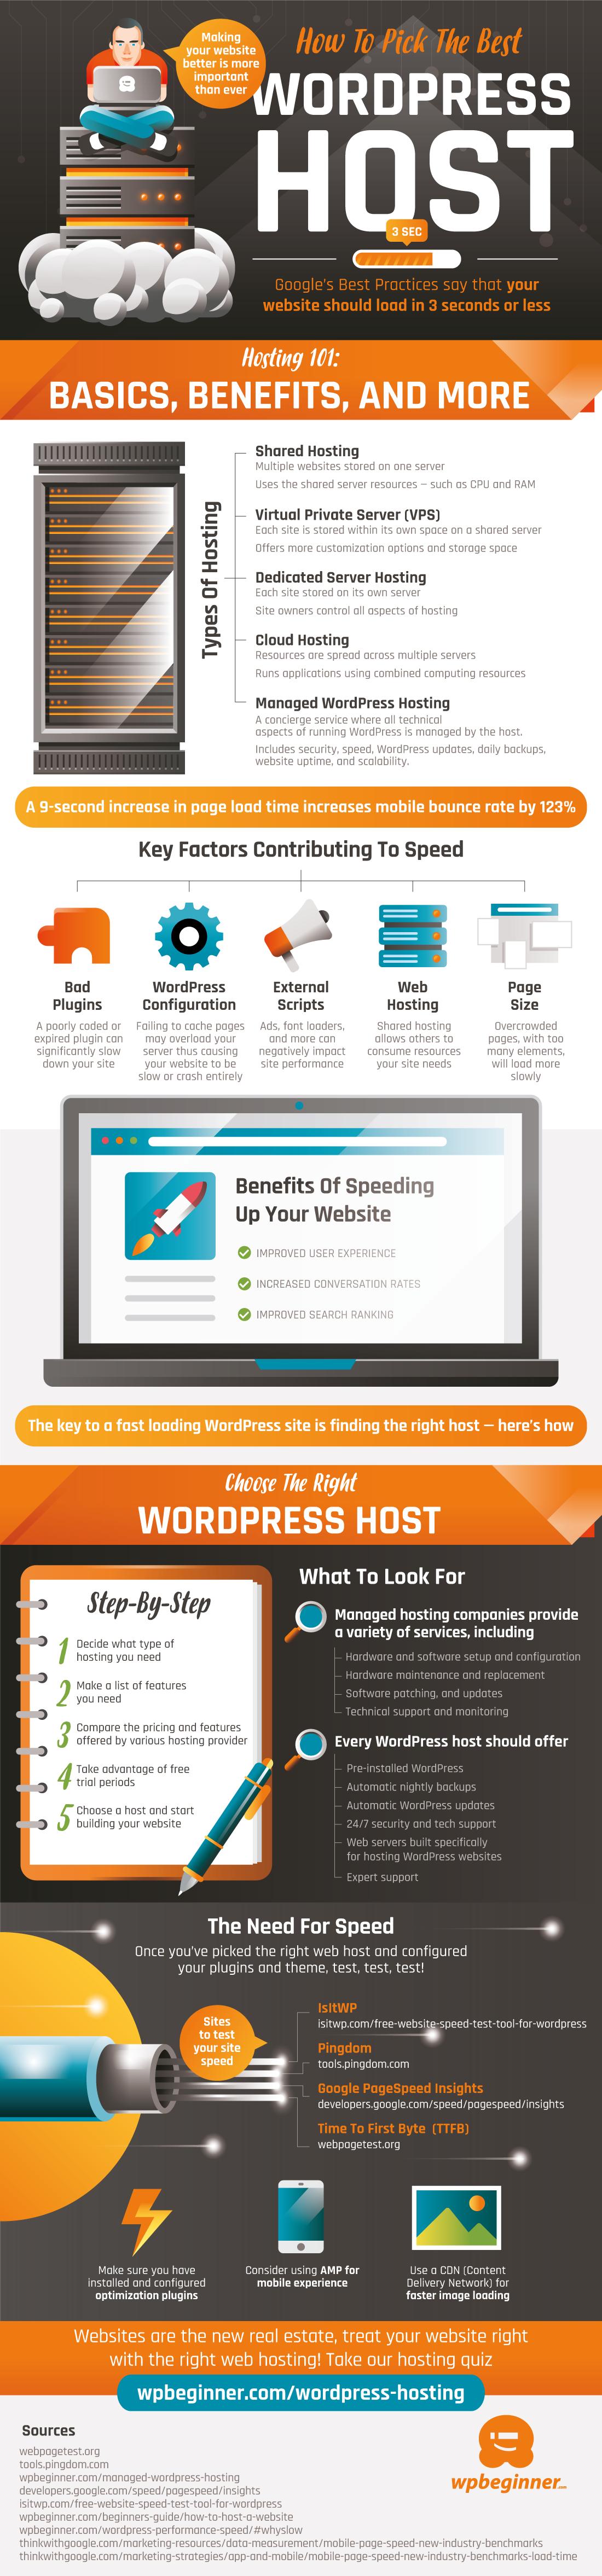 choosing the right WordPress host